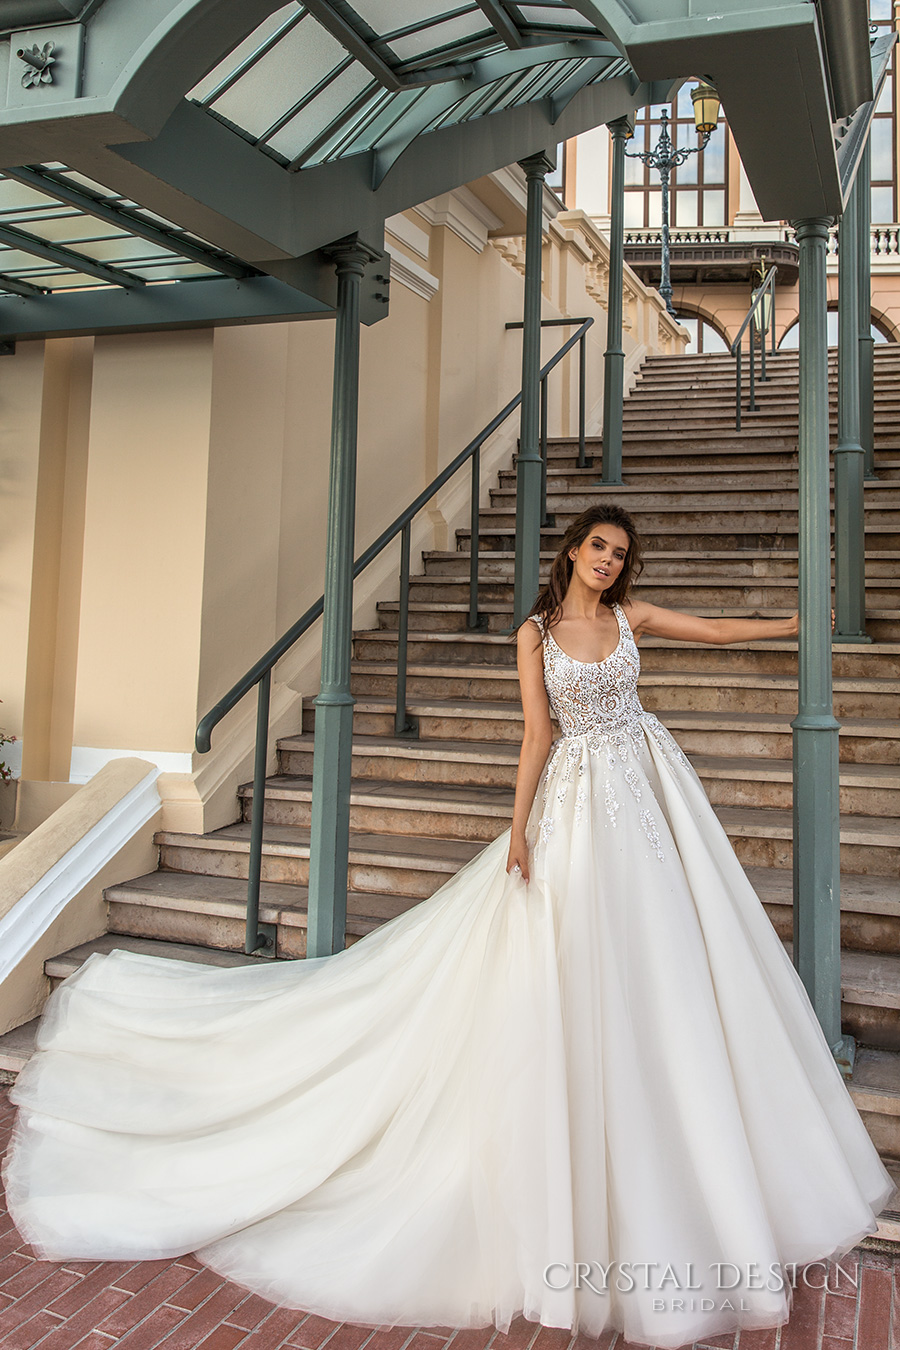 crystal-design-2017-bridal-sleeveless-with-strap-scoop-necklne-heavily-embellished-bodice-romantic-a-line-wedding-dress-scoop-back-royal-long-train-carven-mv